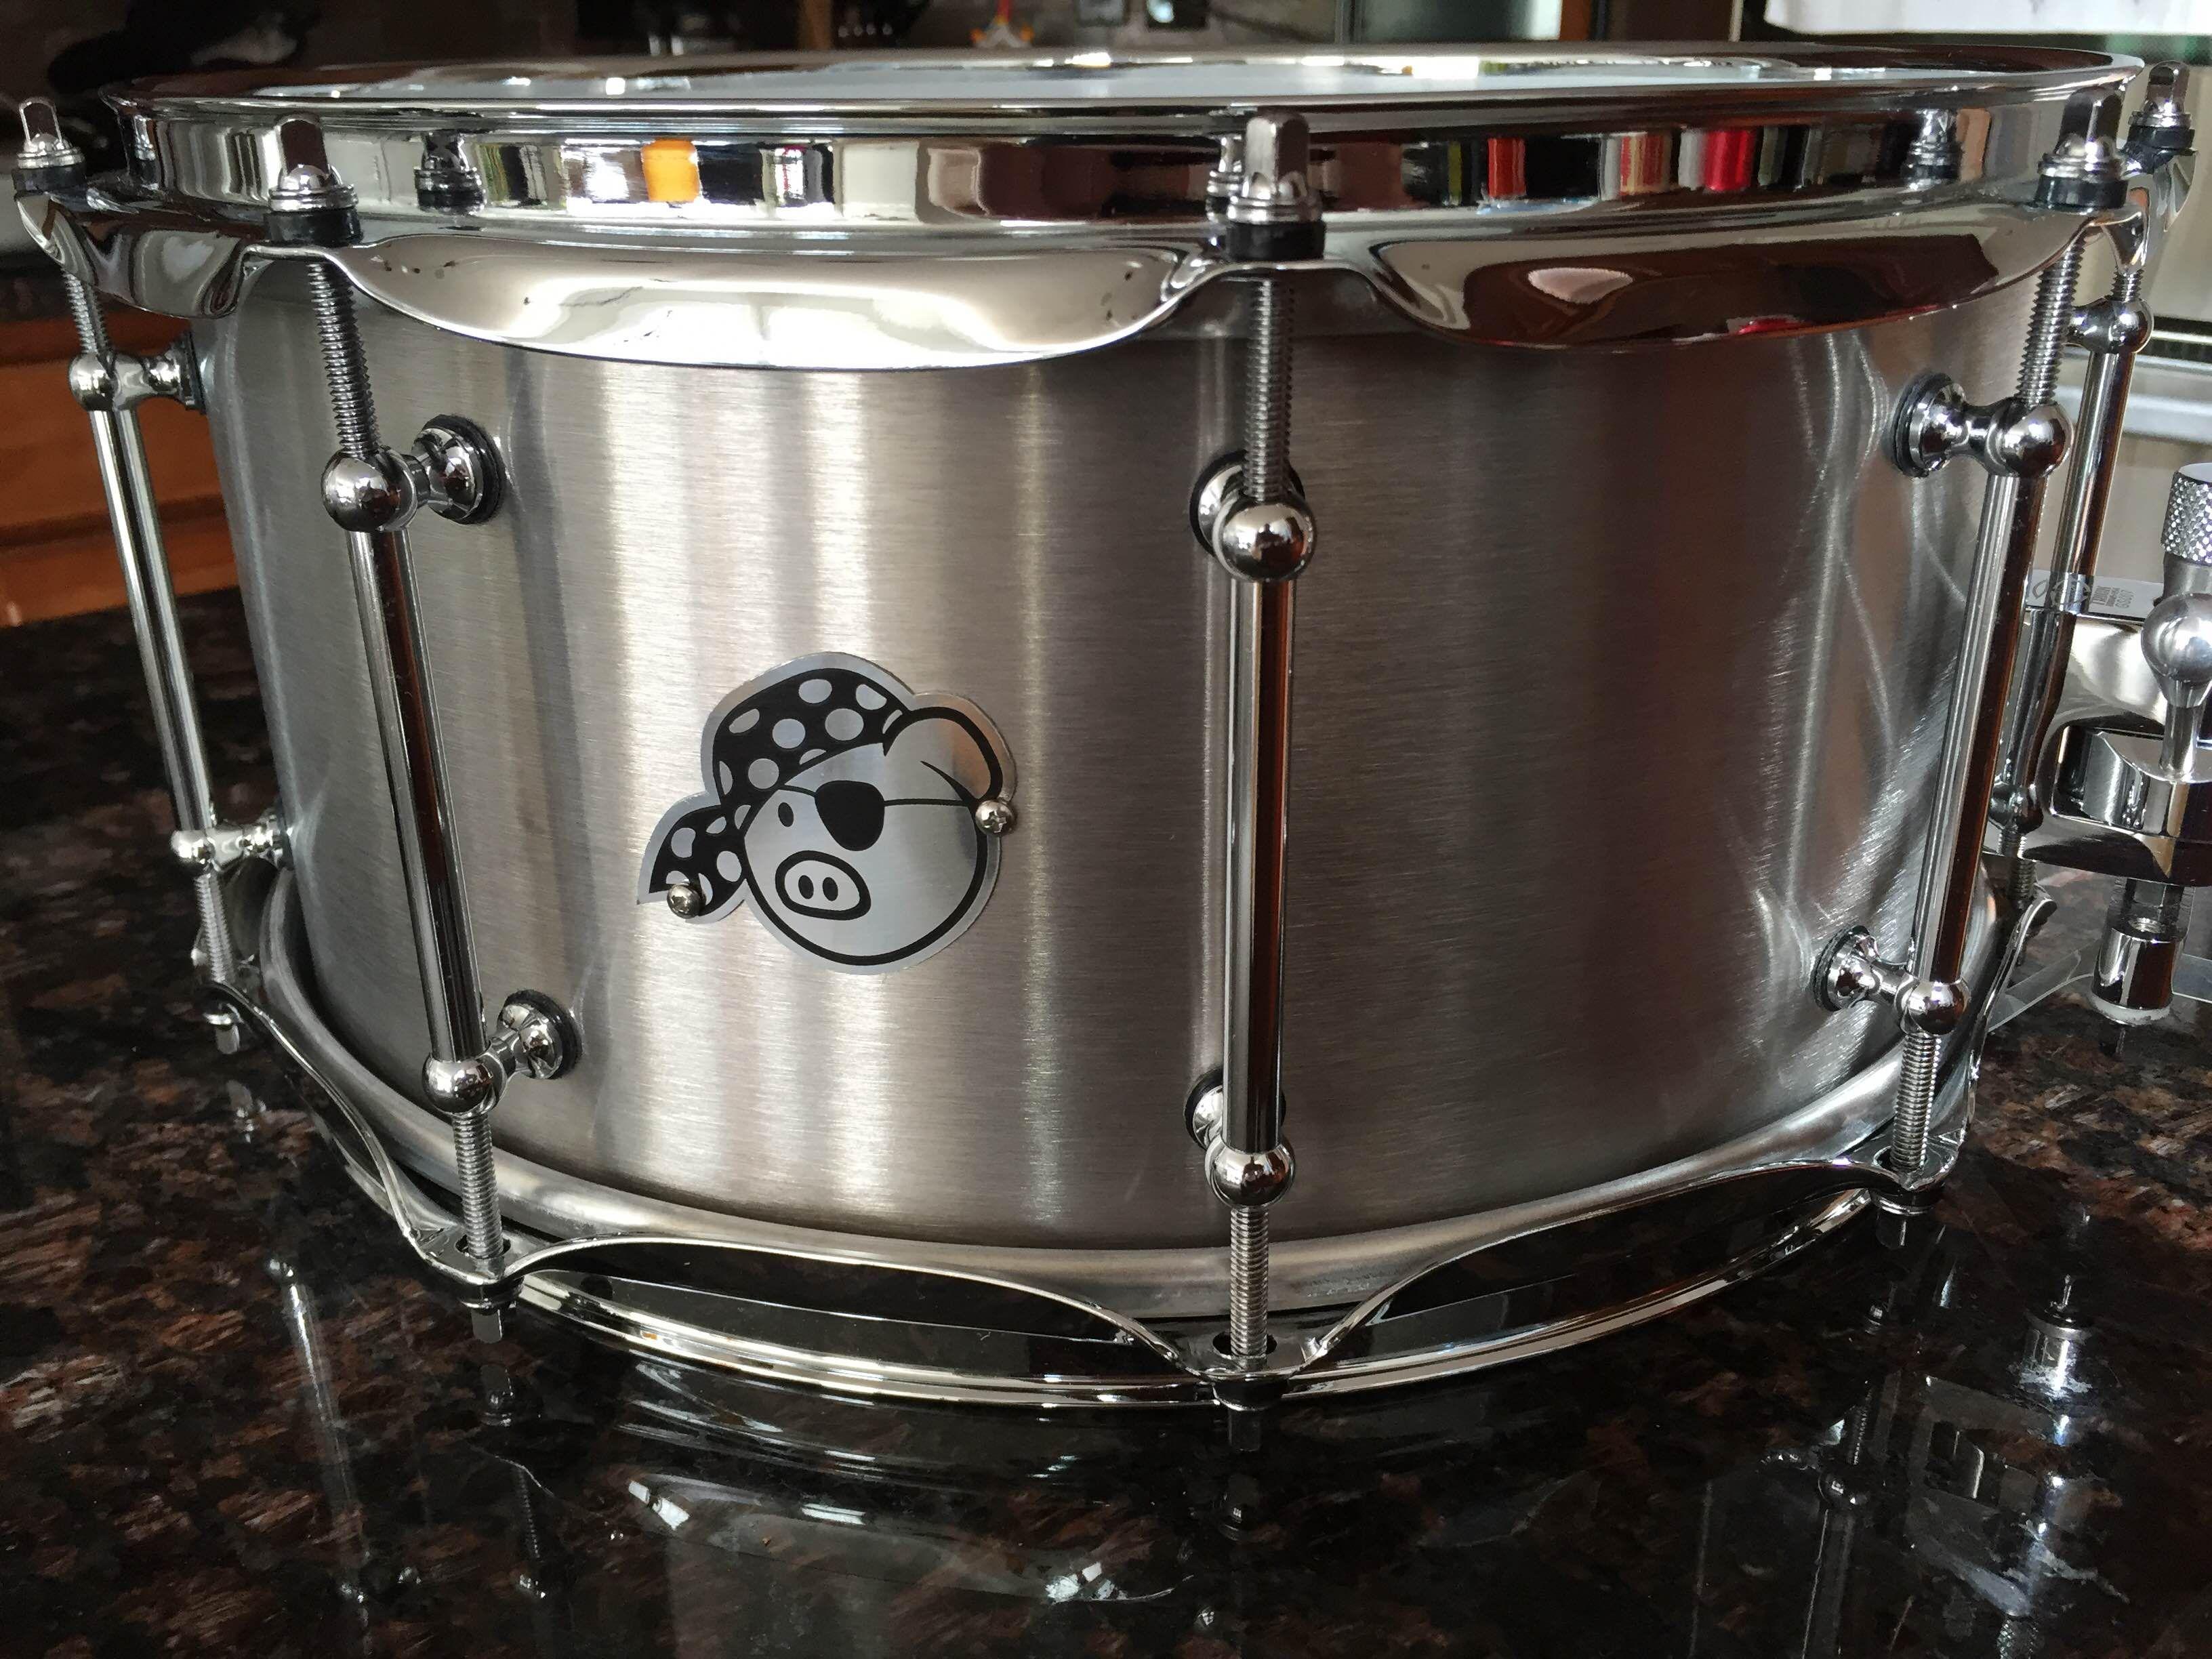 This is a one-off Pork Pie Titanium snare drum built custom for me ...